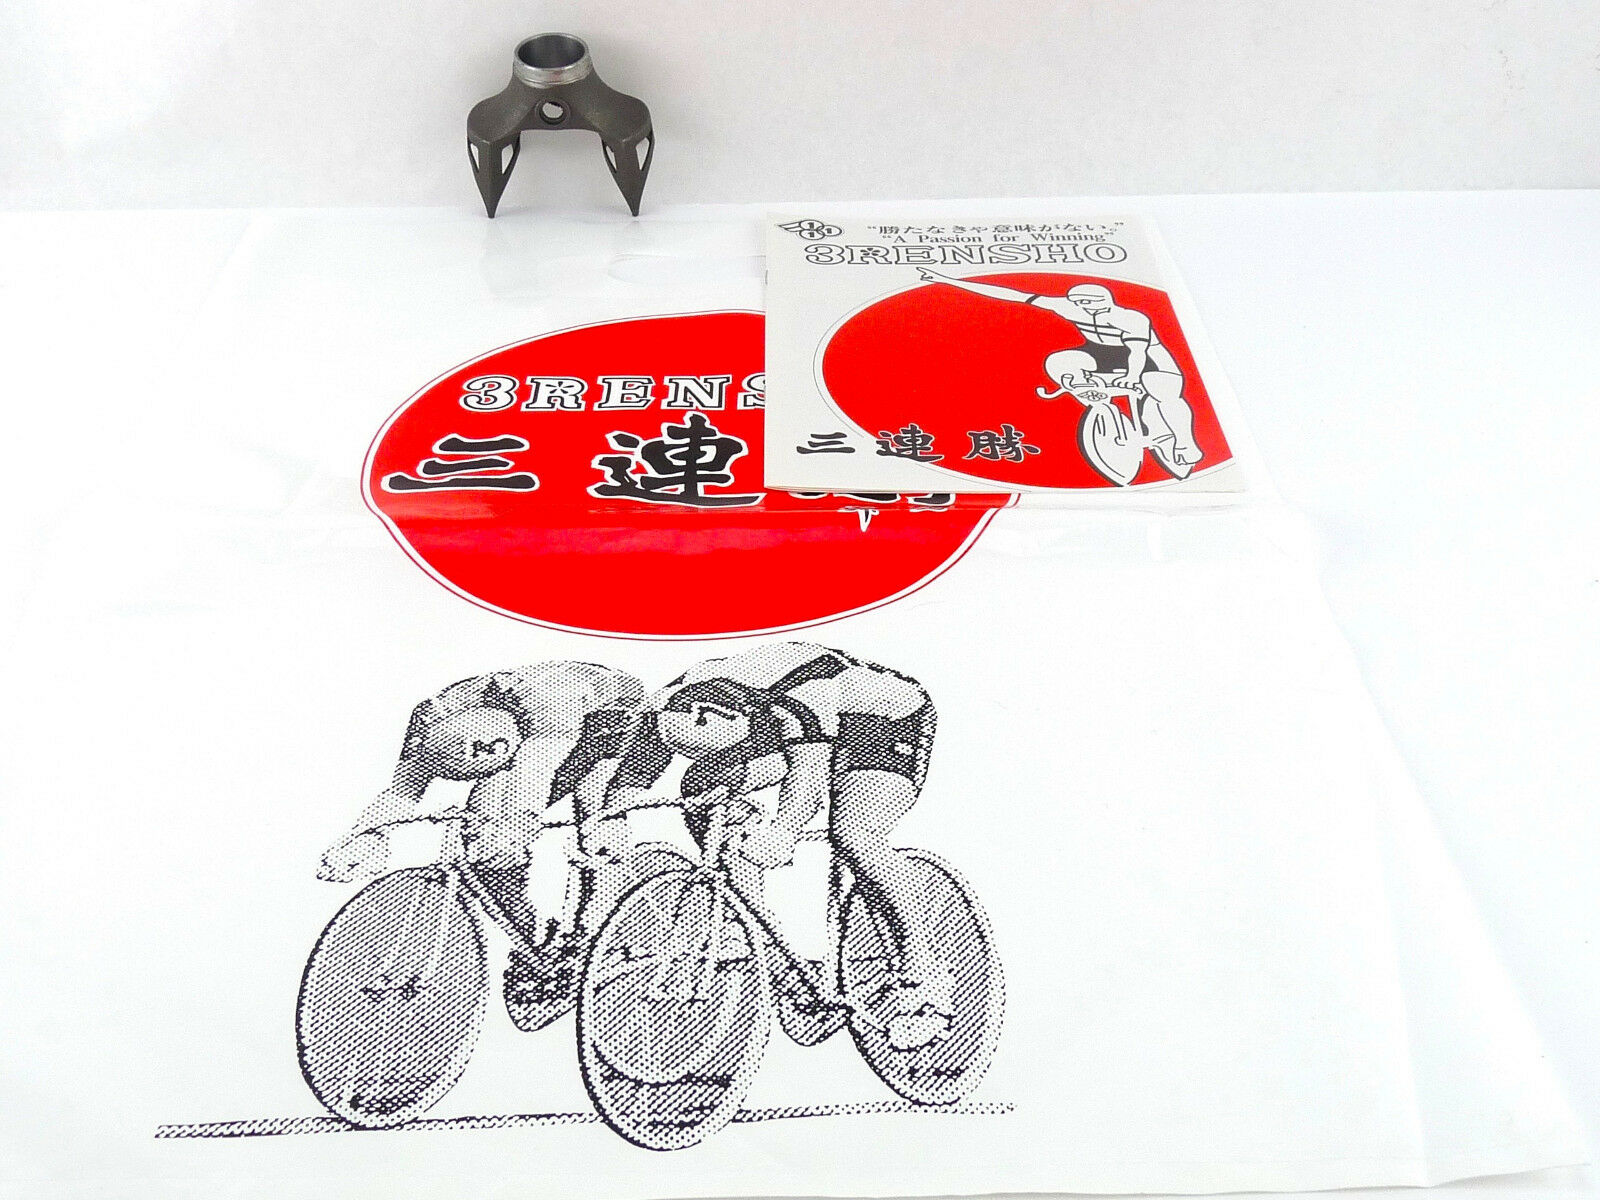 3Rensho Fork Crown Yoshi Konno Asymmetric Tear Drop Blades w catalog & Bag NOS